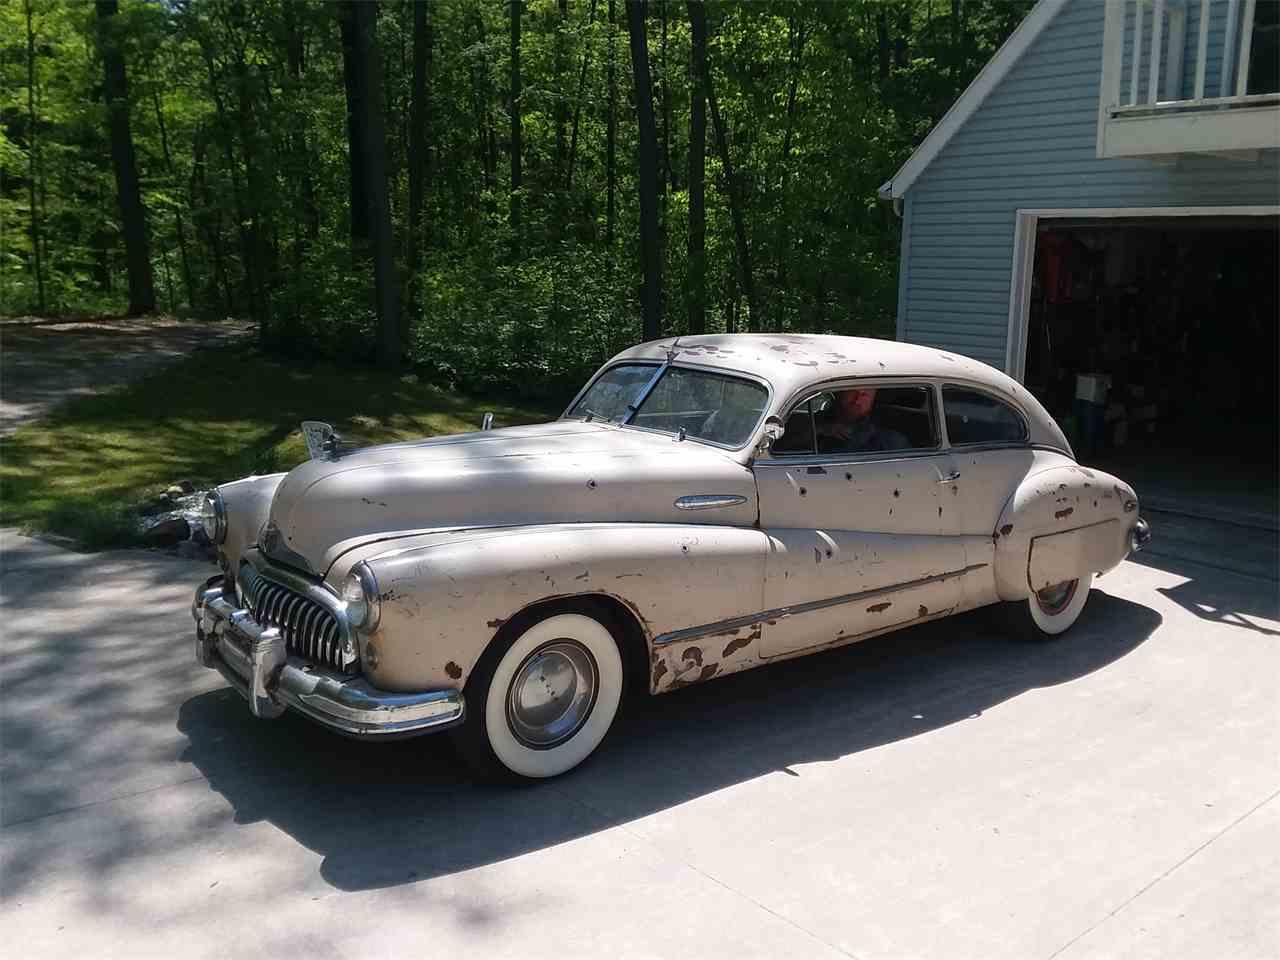 1948 Buick Roadmaster for Sale | ClassicCars.com | CC-1010621